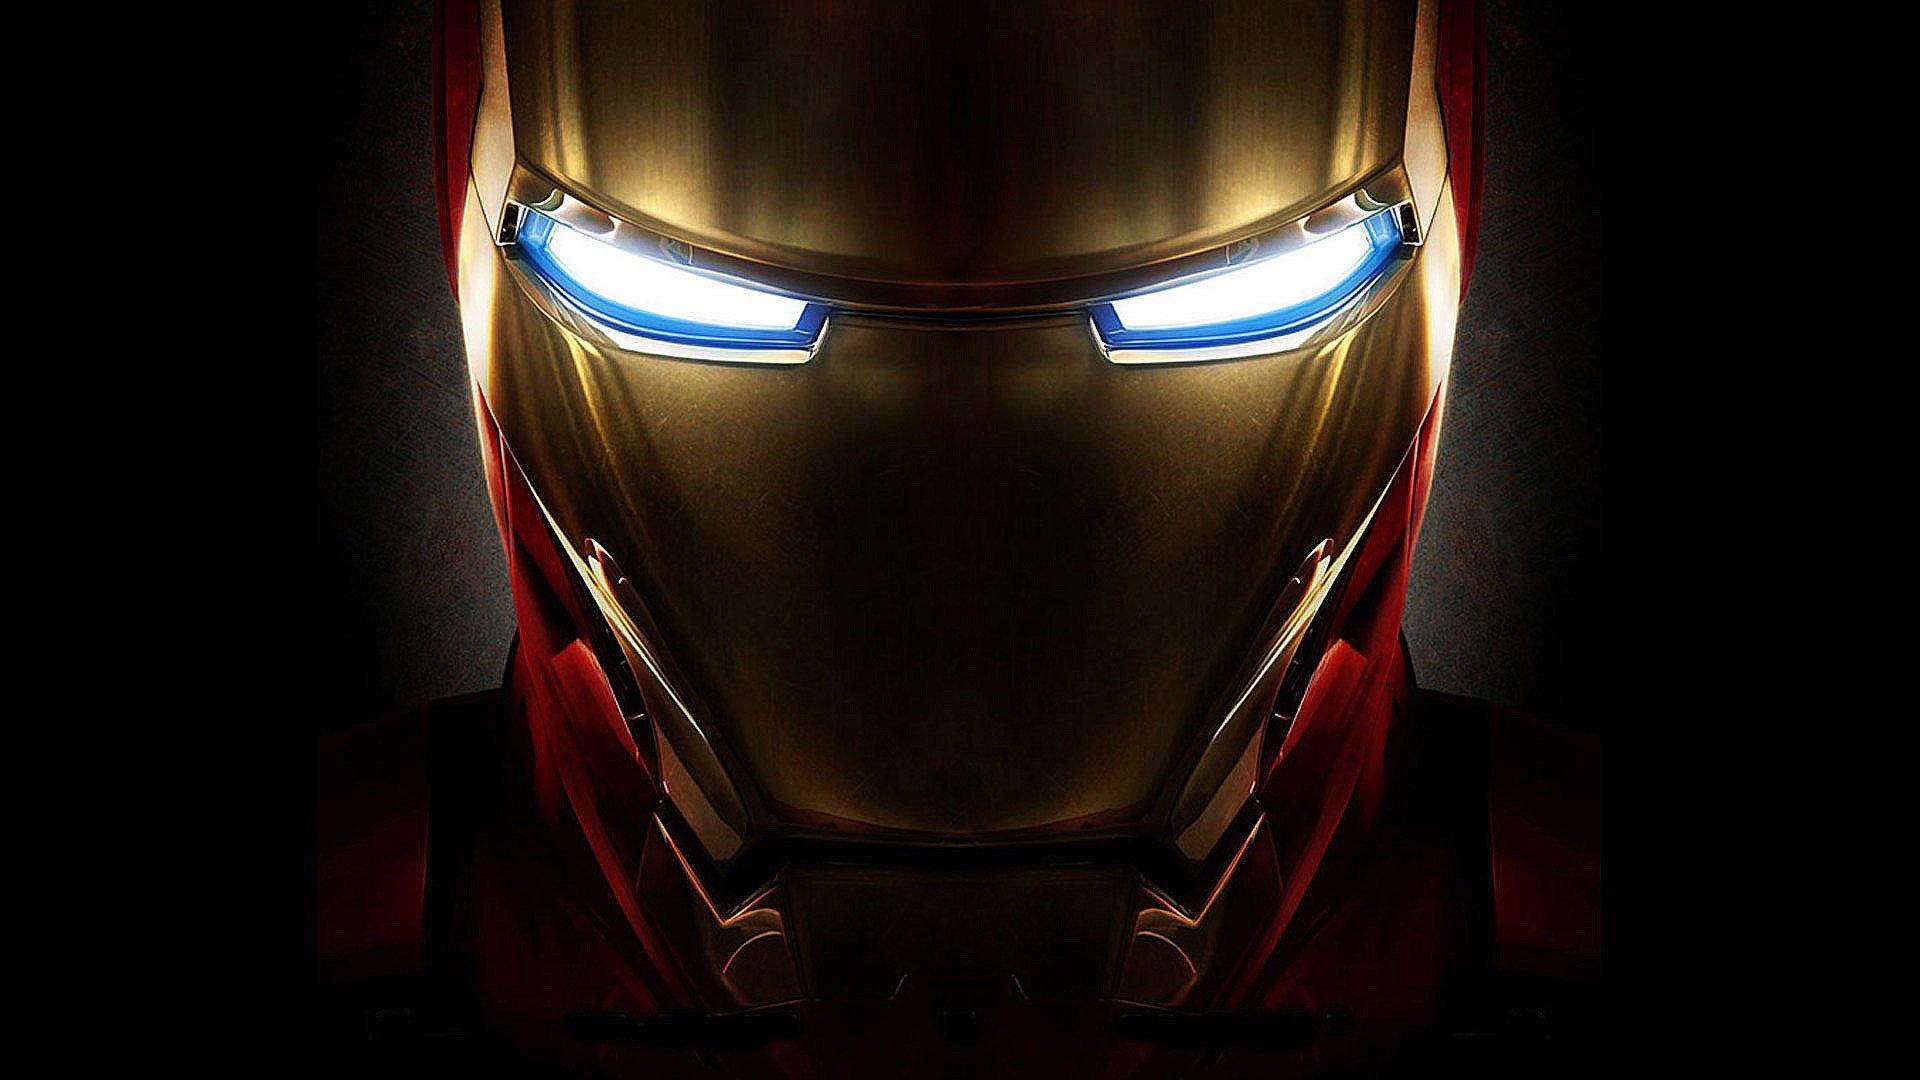 iron man 3 hd wallpaper | background image | 1920x1080 | id:608833